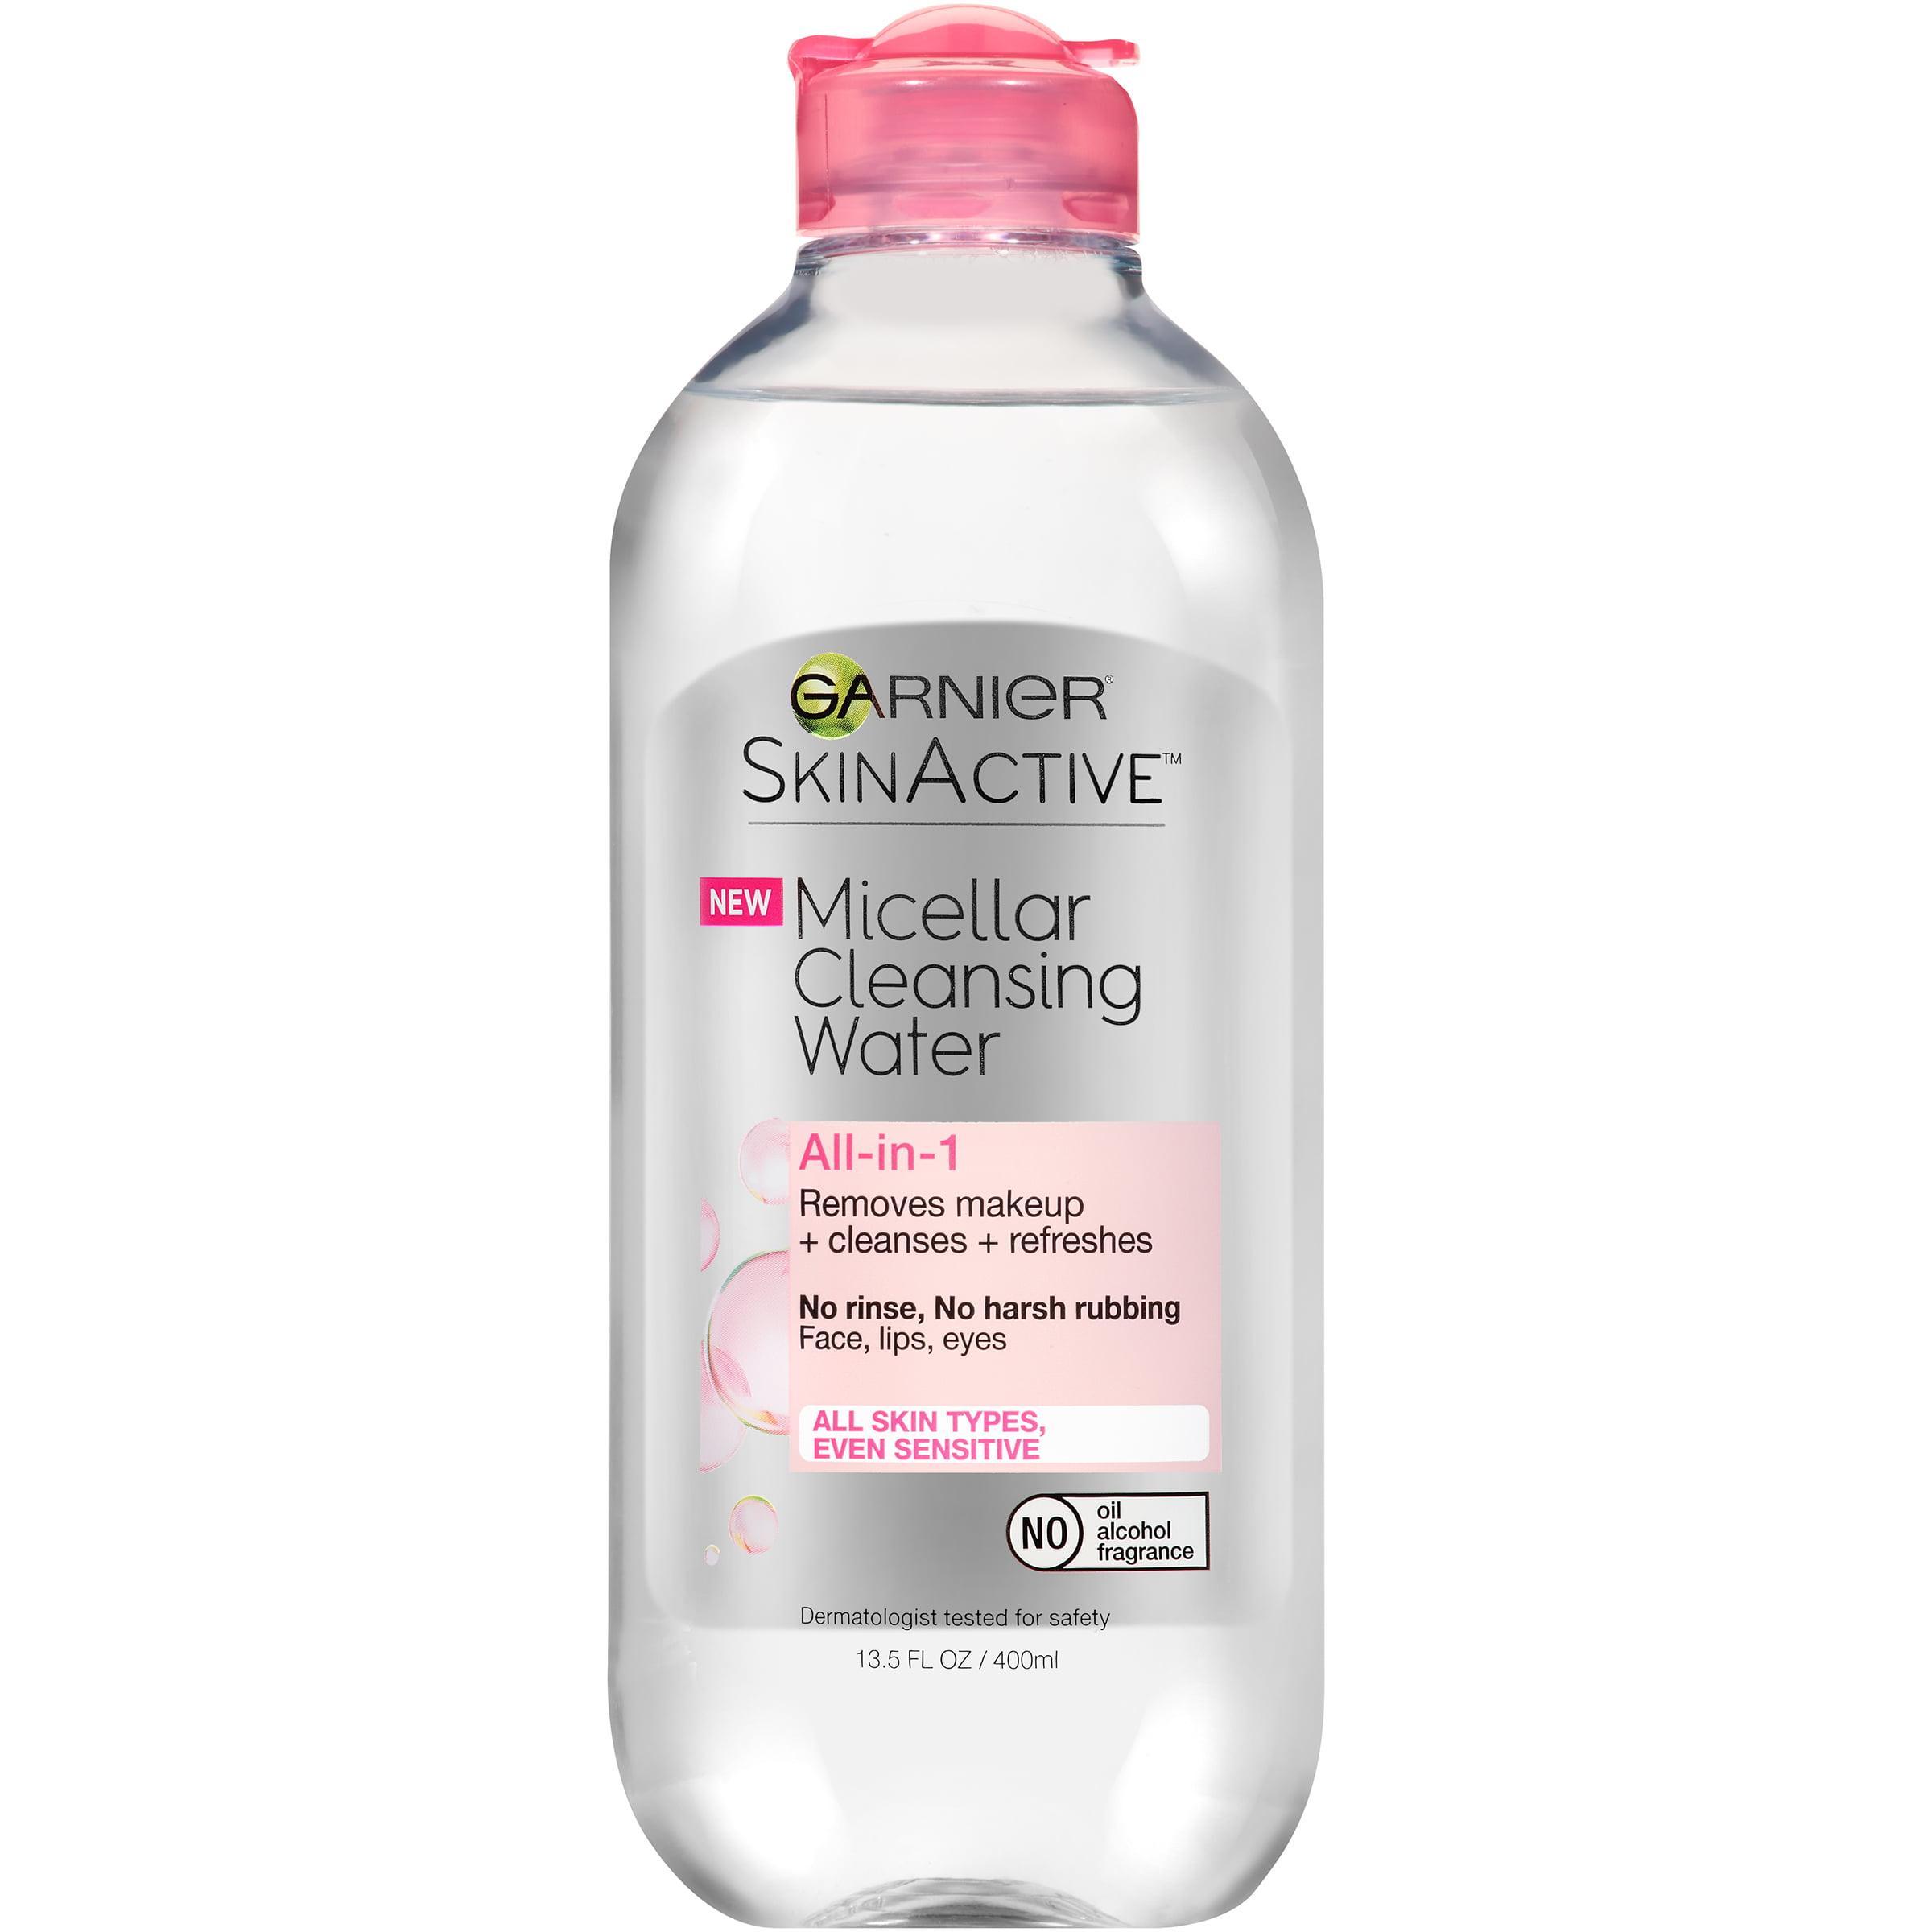 Garnier Skin Active Micellar Cleansing Water 13.5 fl. oz. Bottle